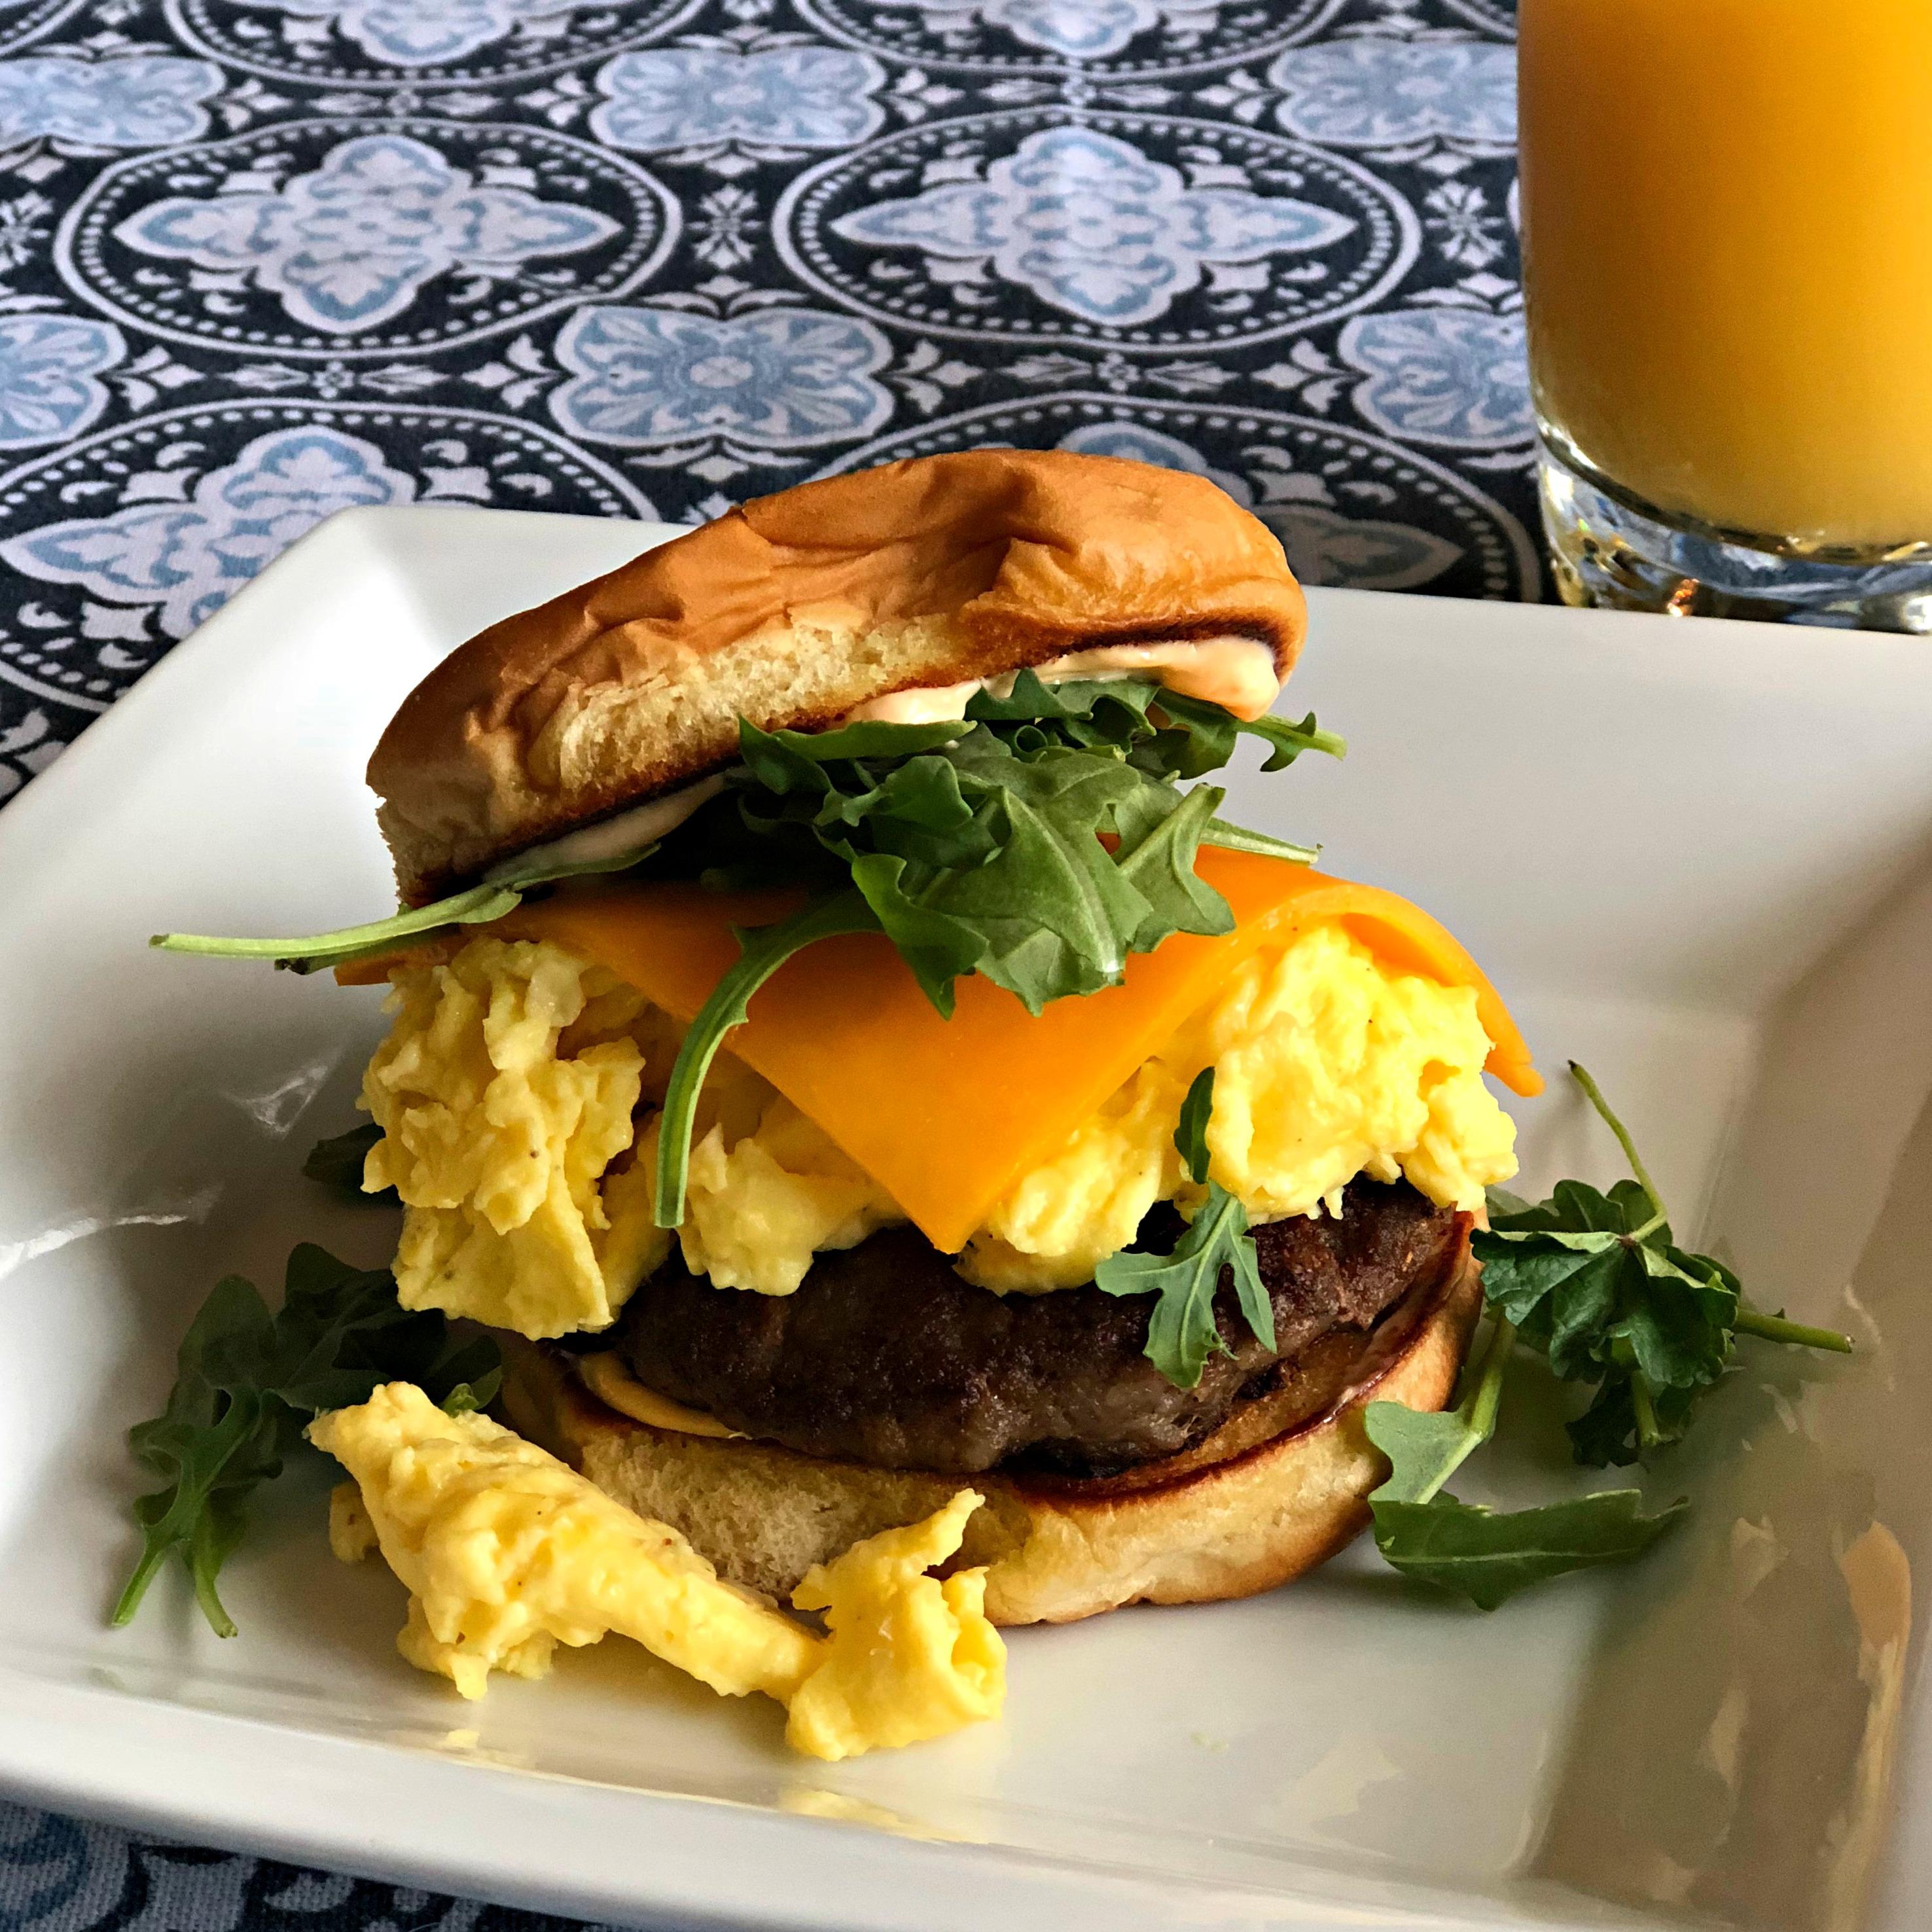 Egg, Sausage and Cheese Breakfast Sandwich Happyschmoopies